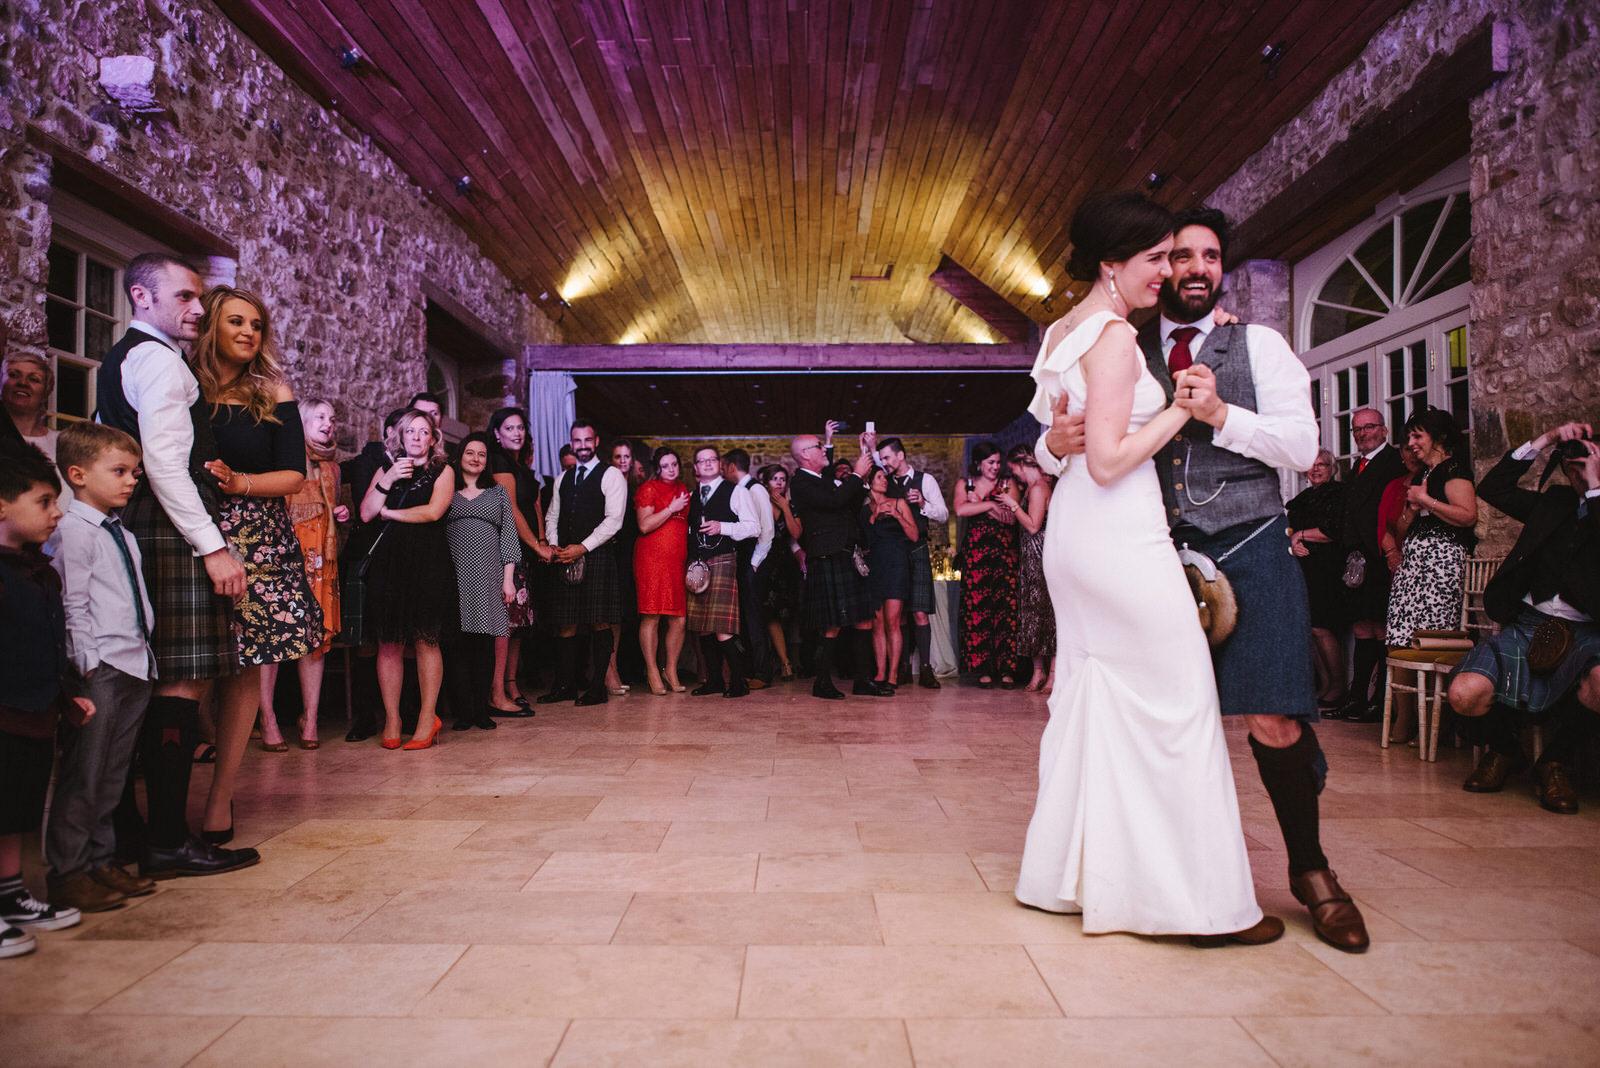 041-COLSTOUN-HOUSE-WEDDING-ALTERNATIVE-WEDDING-PHOTOGRAPHER-GLASGOW-WEDDING-PHOTOGRAPHER-STYLISH-SCOTTISH-WEDDING.JPG